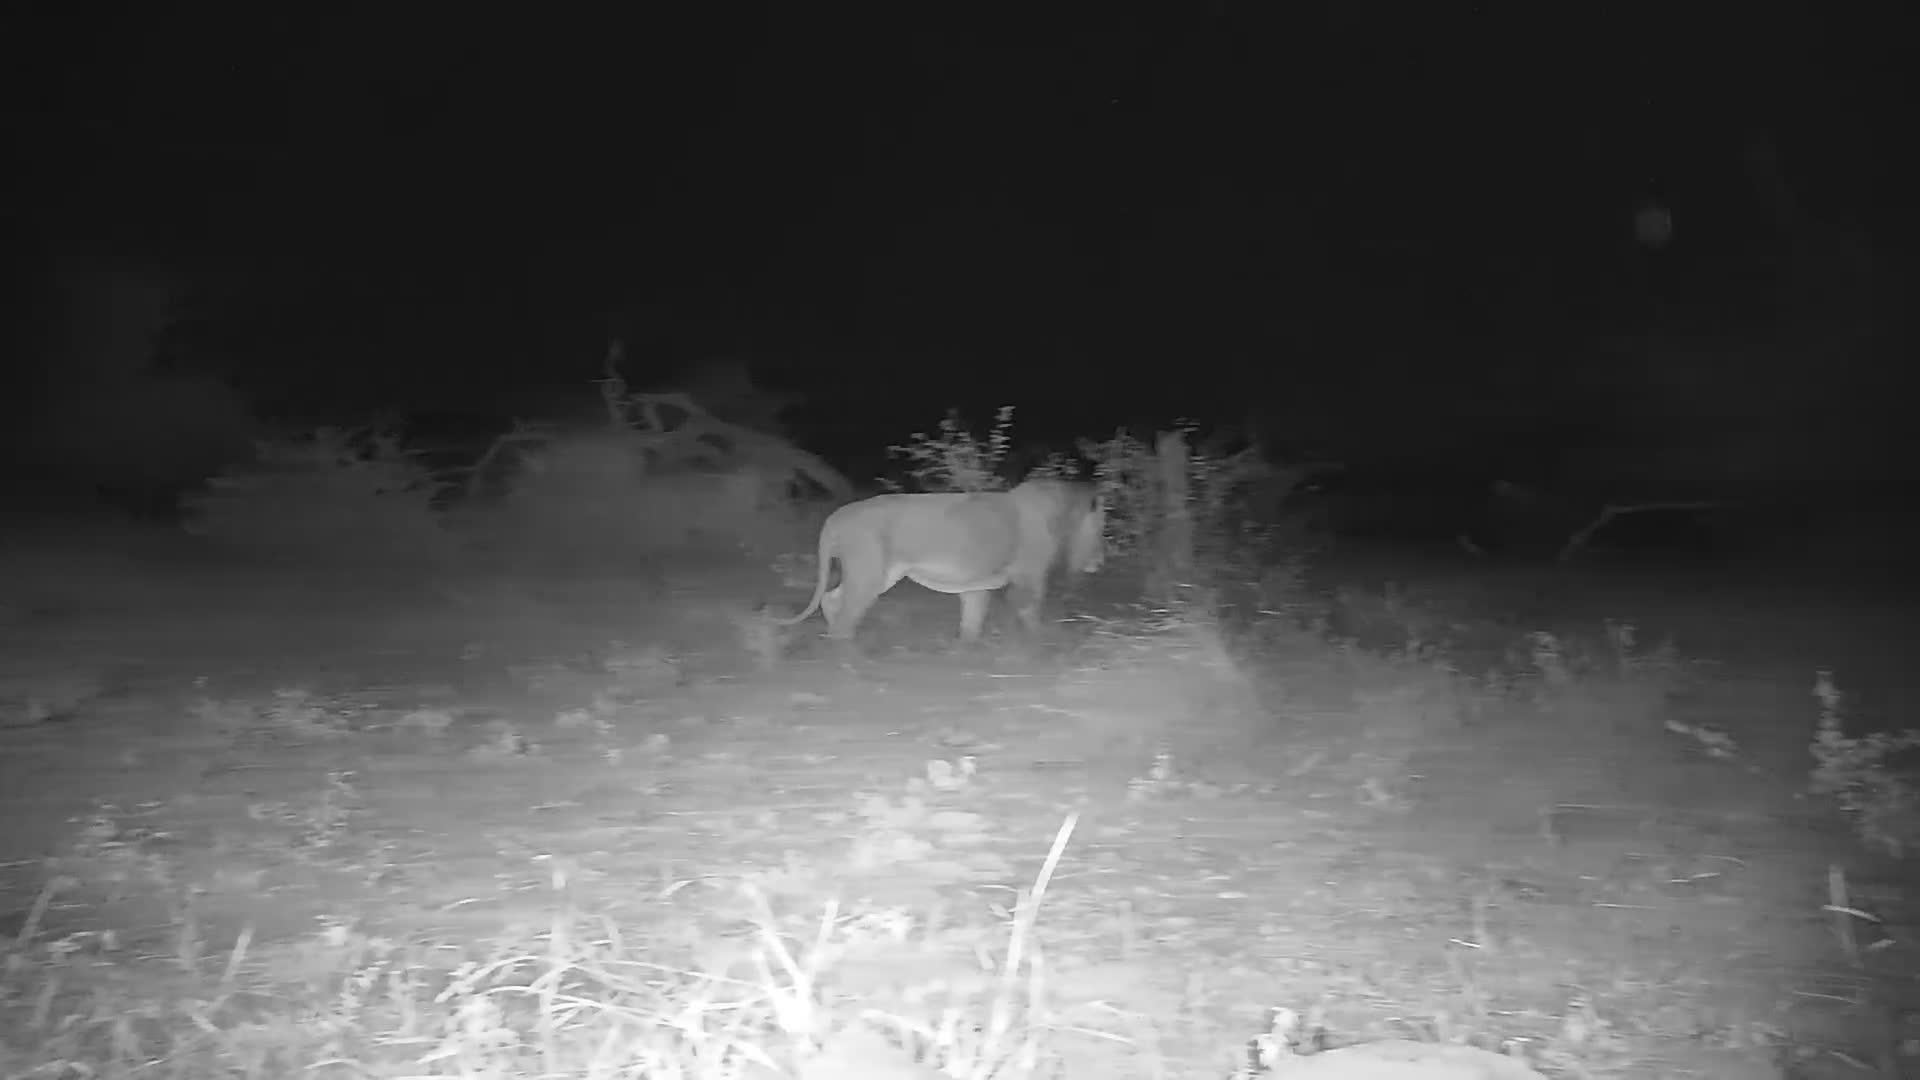 VIDEO: Lion passing through